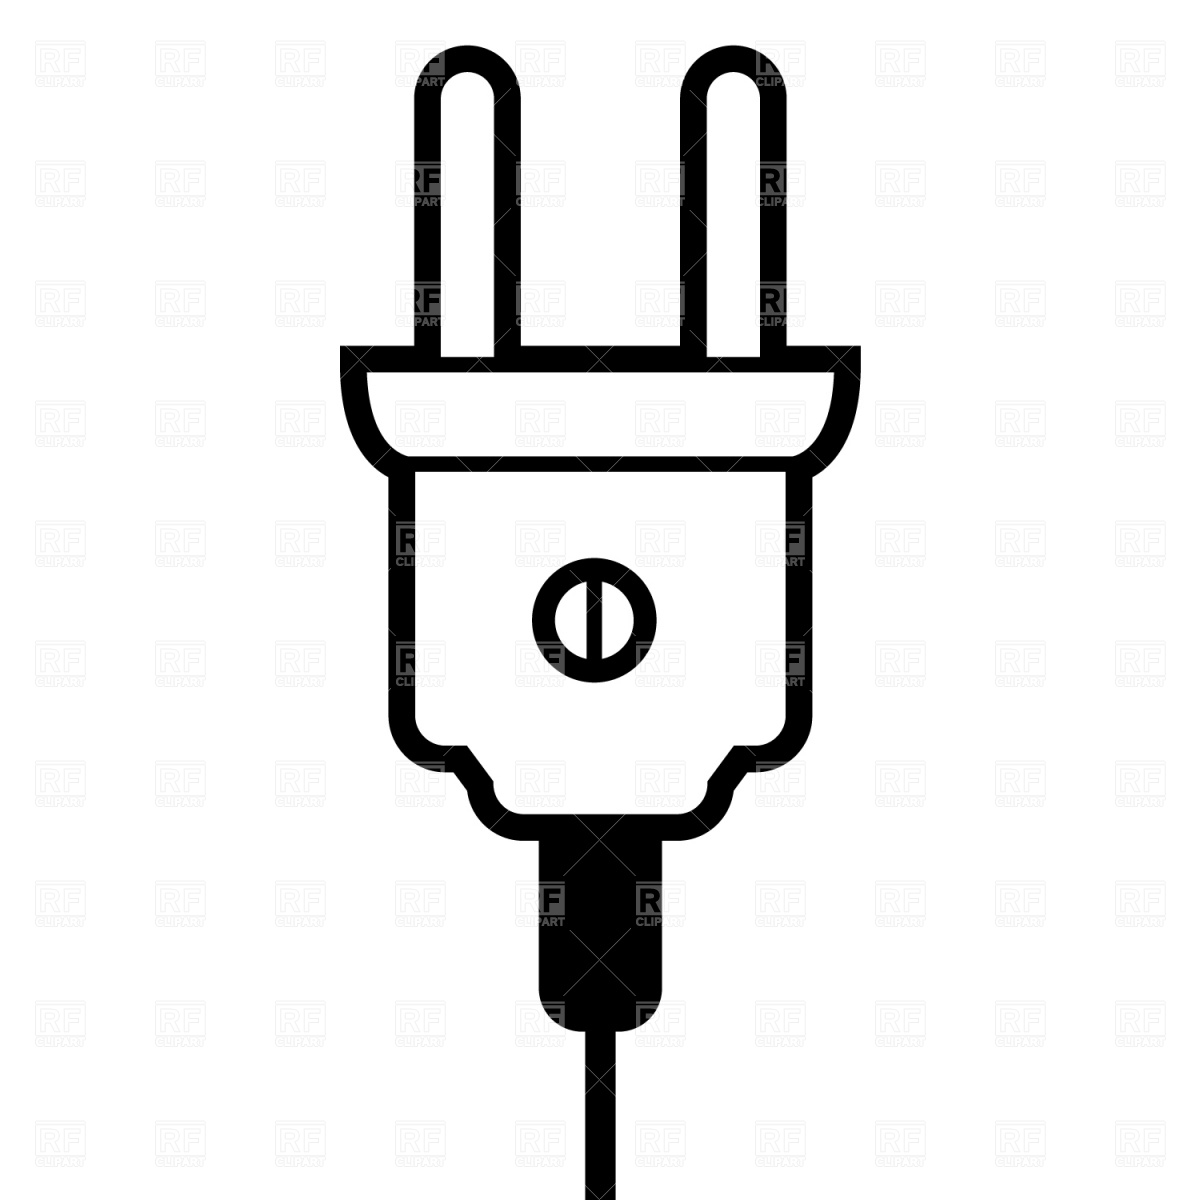 Plug Clipart.